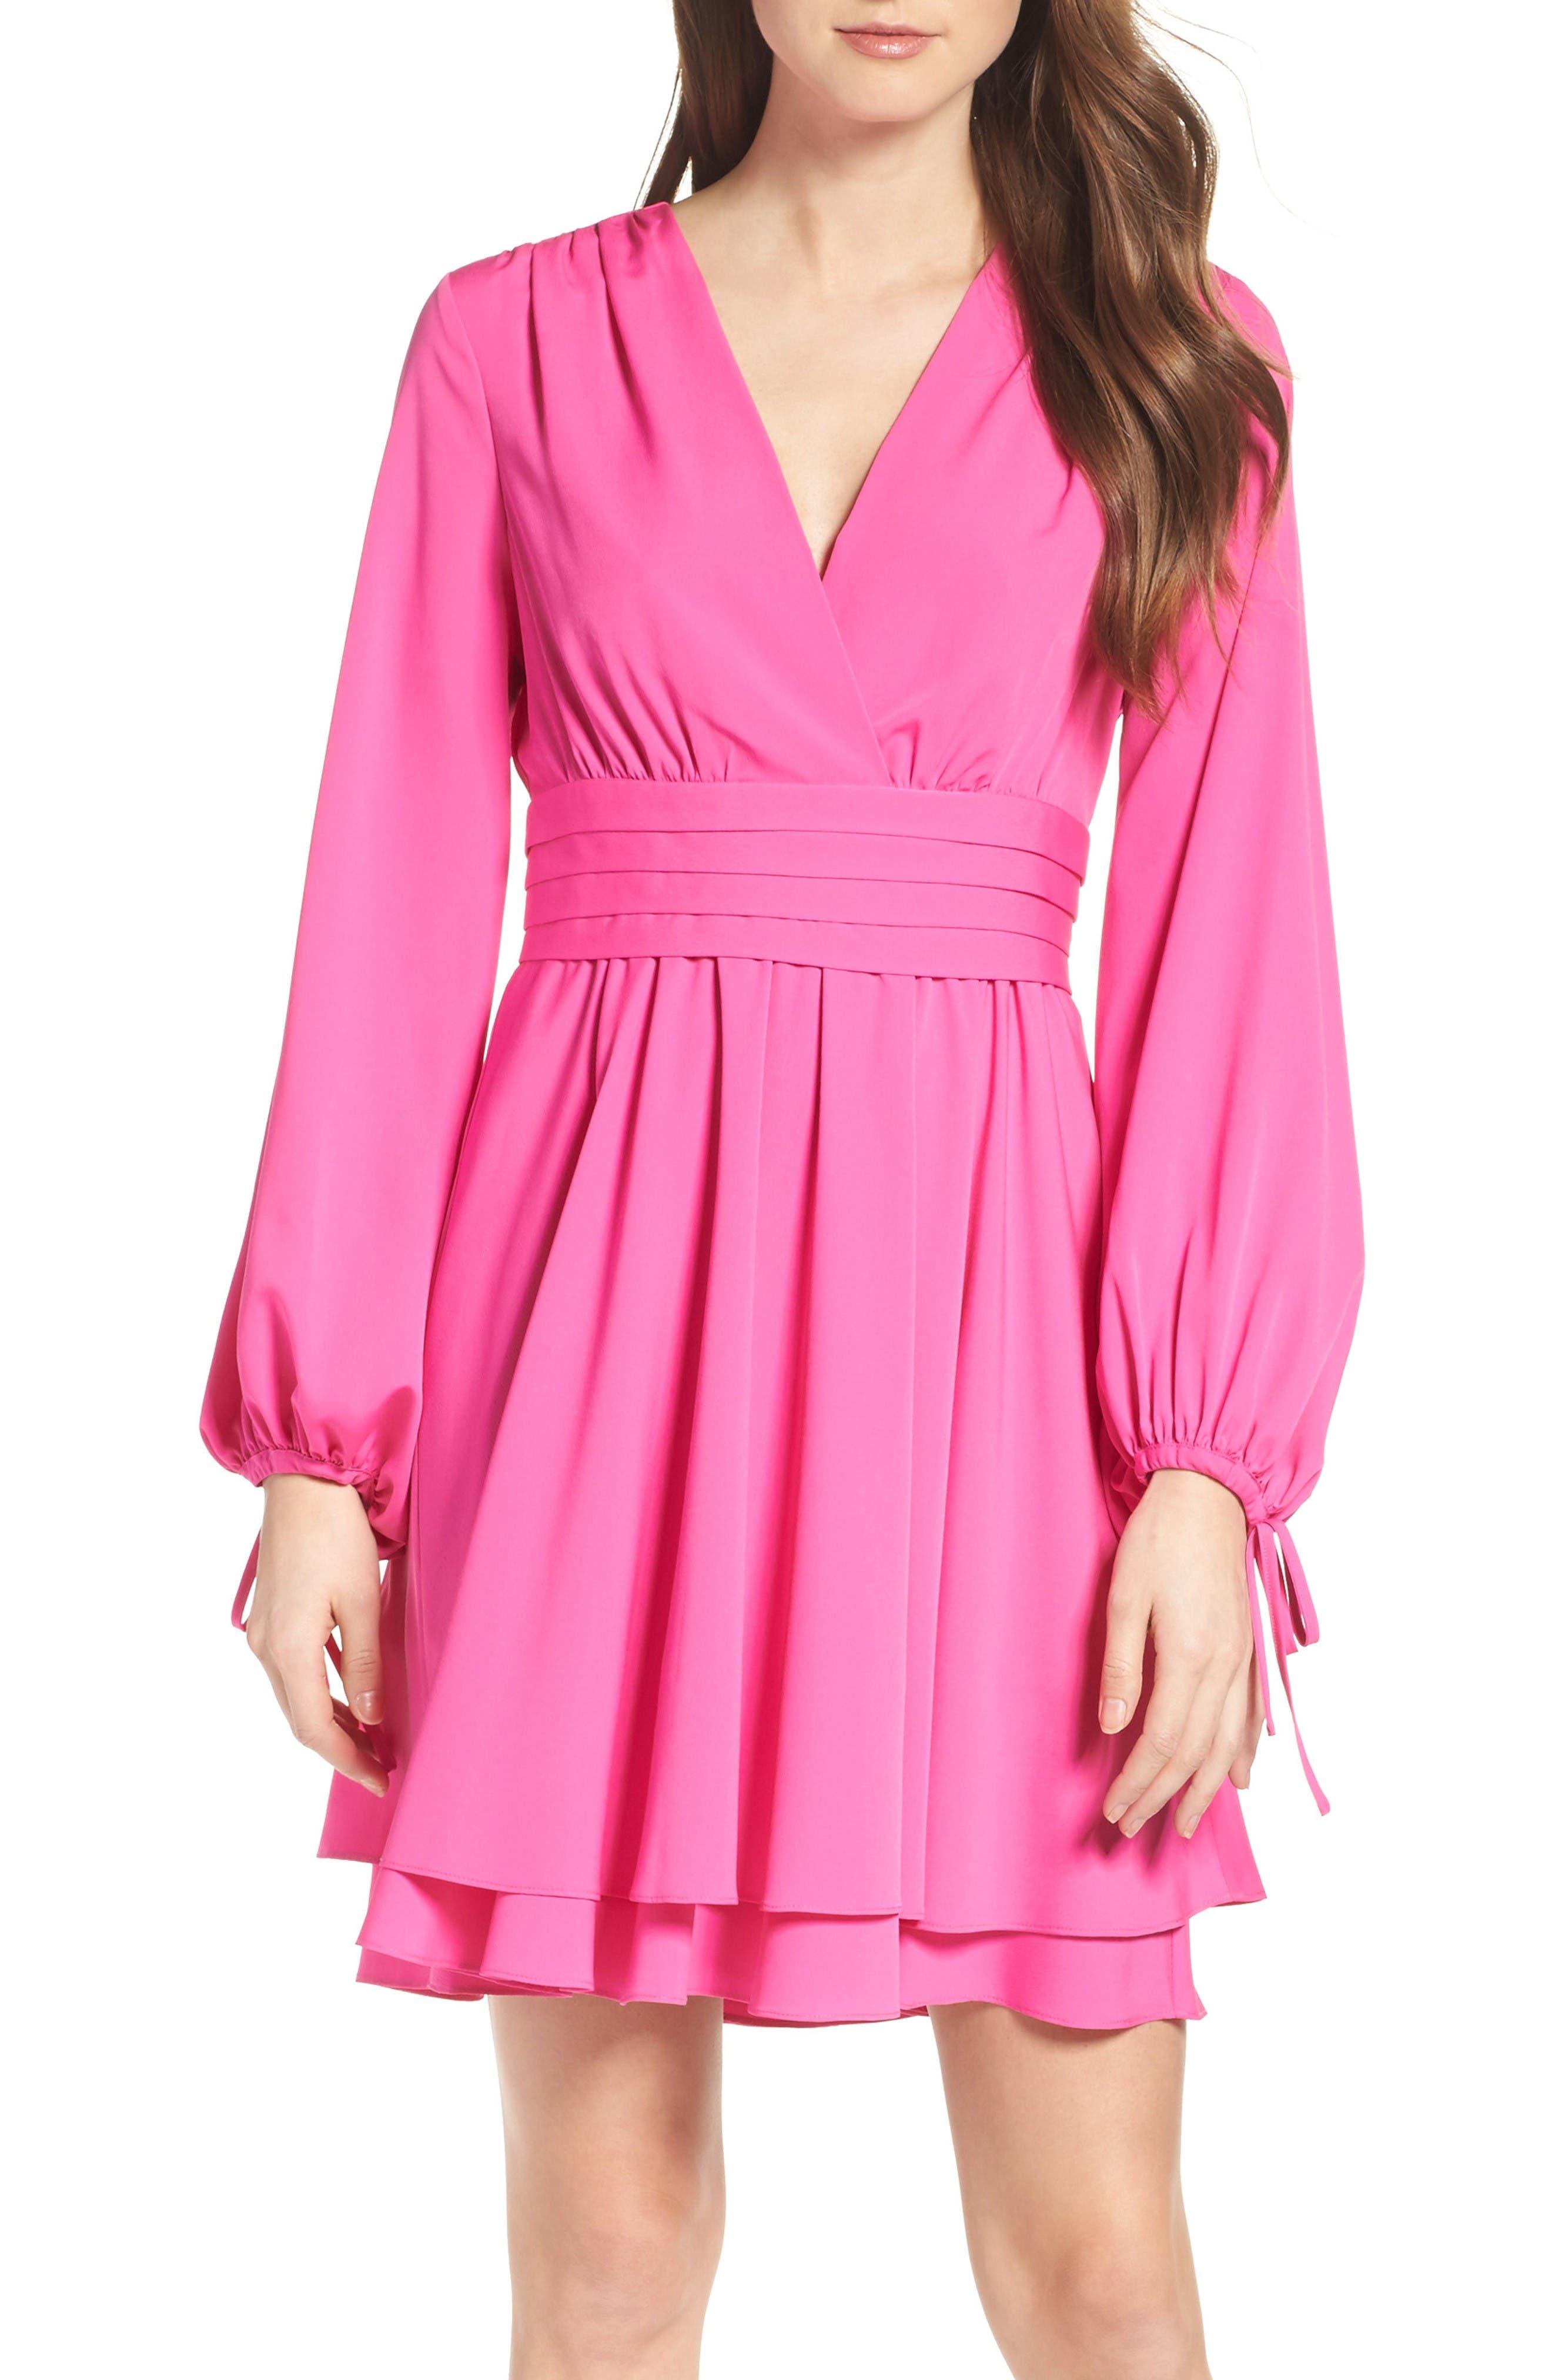 Main Image - Eliza J Tie Sleeve Fit & Flare Dress (Regular & Petite)